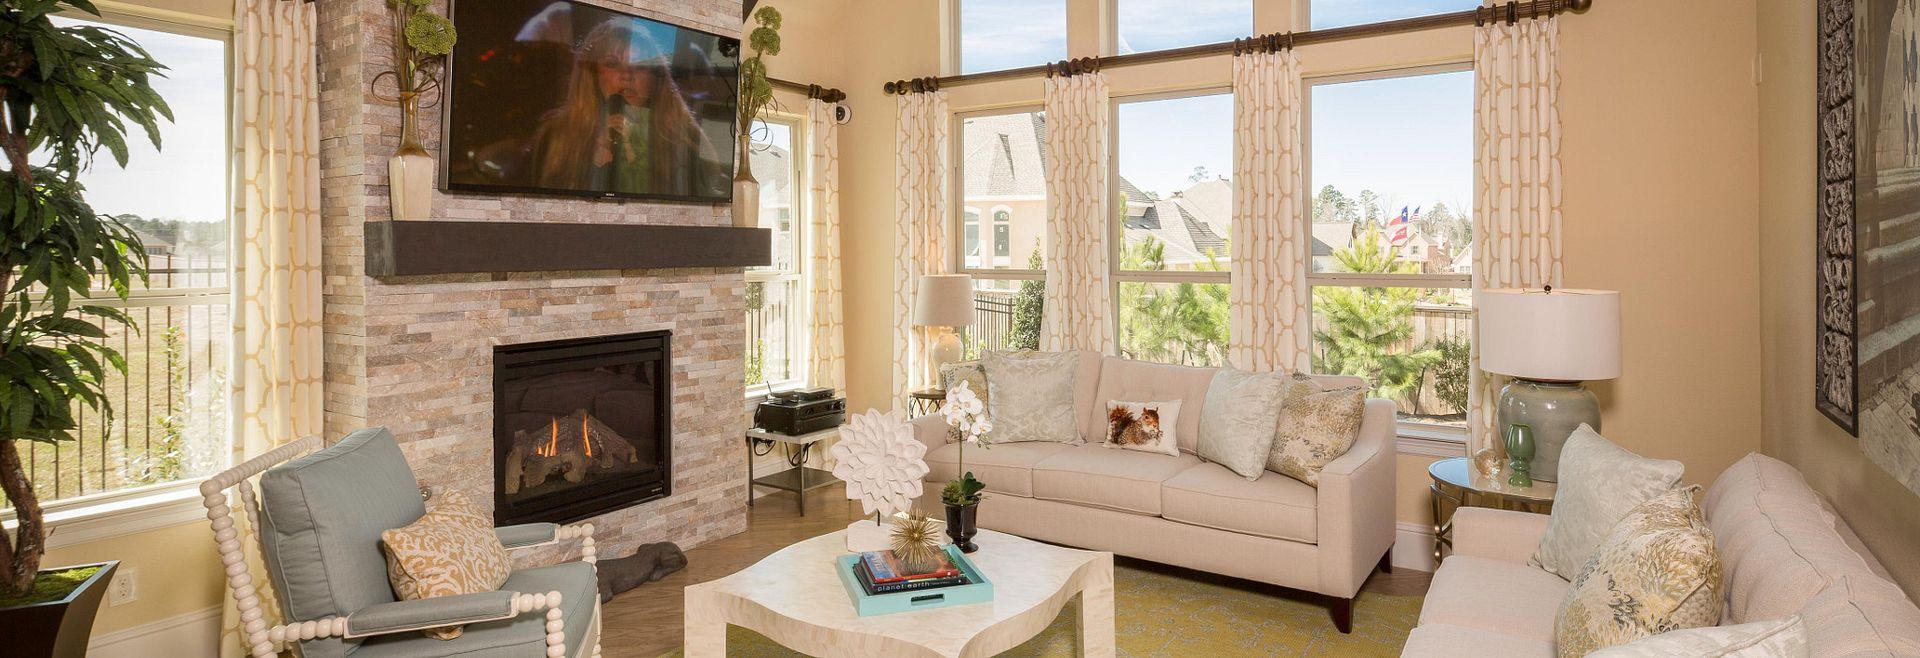 Plan 5022 Living Area